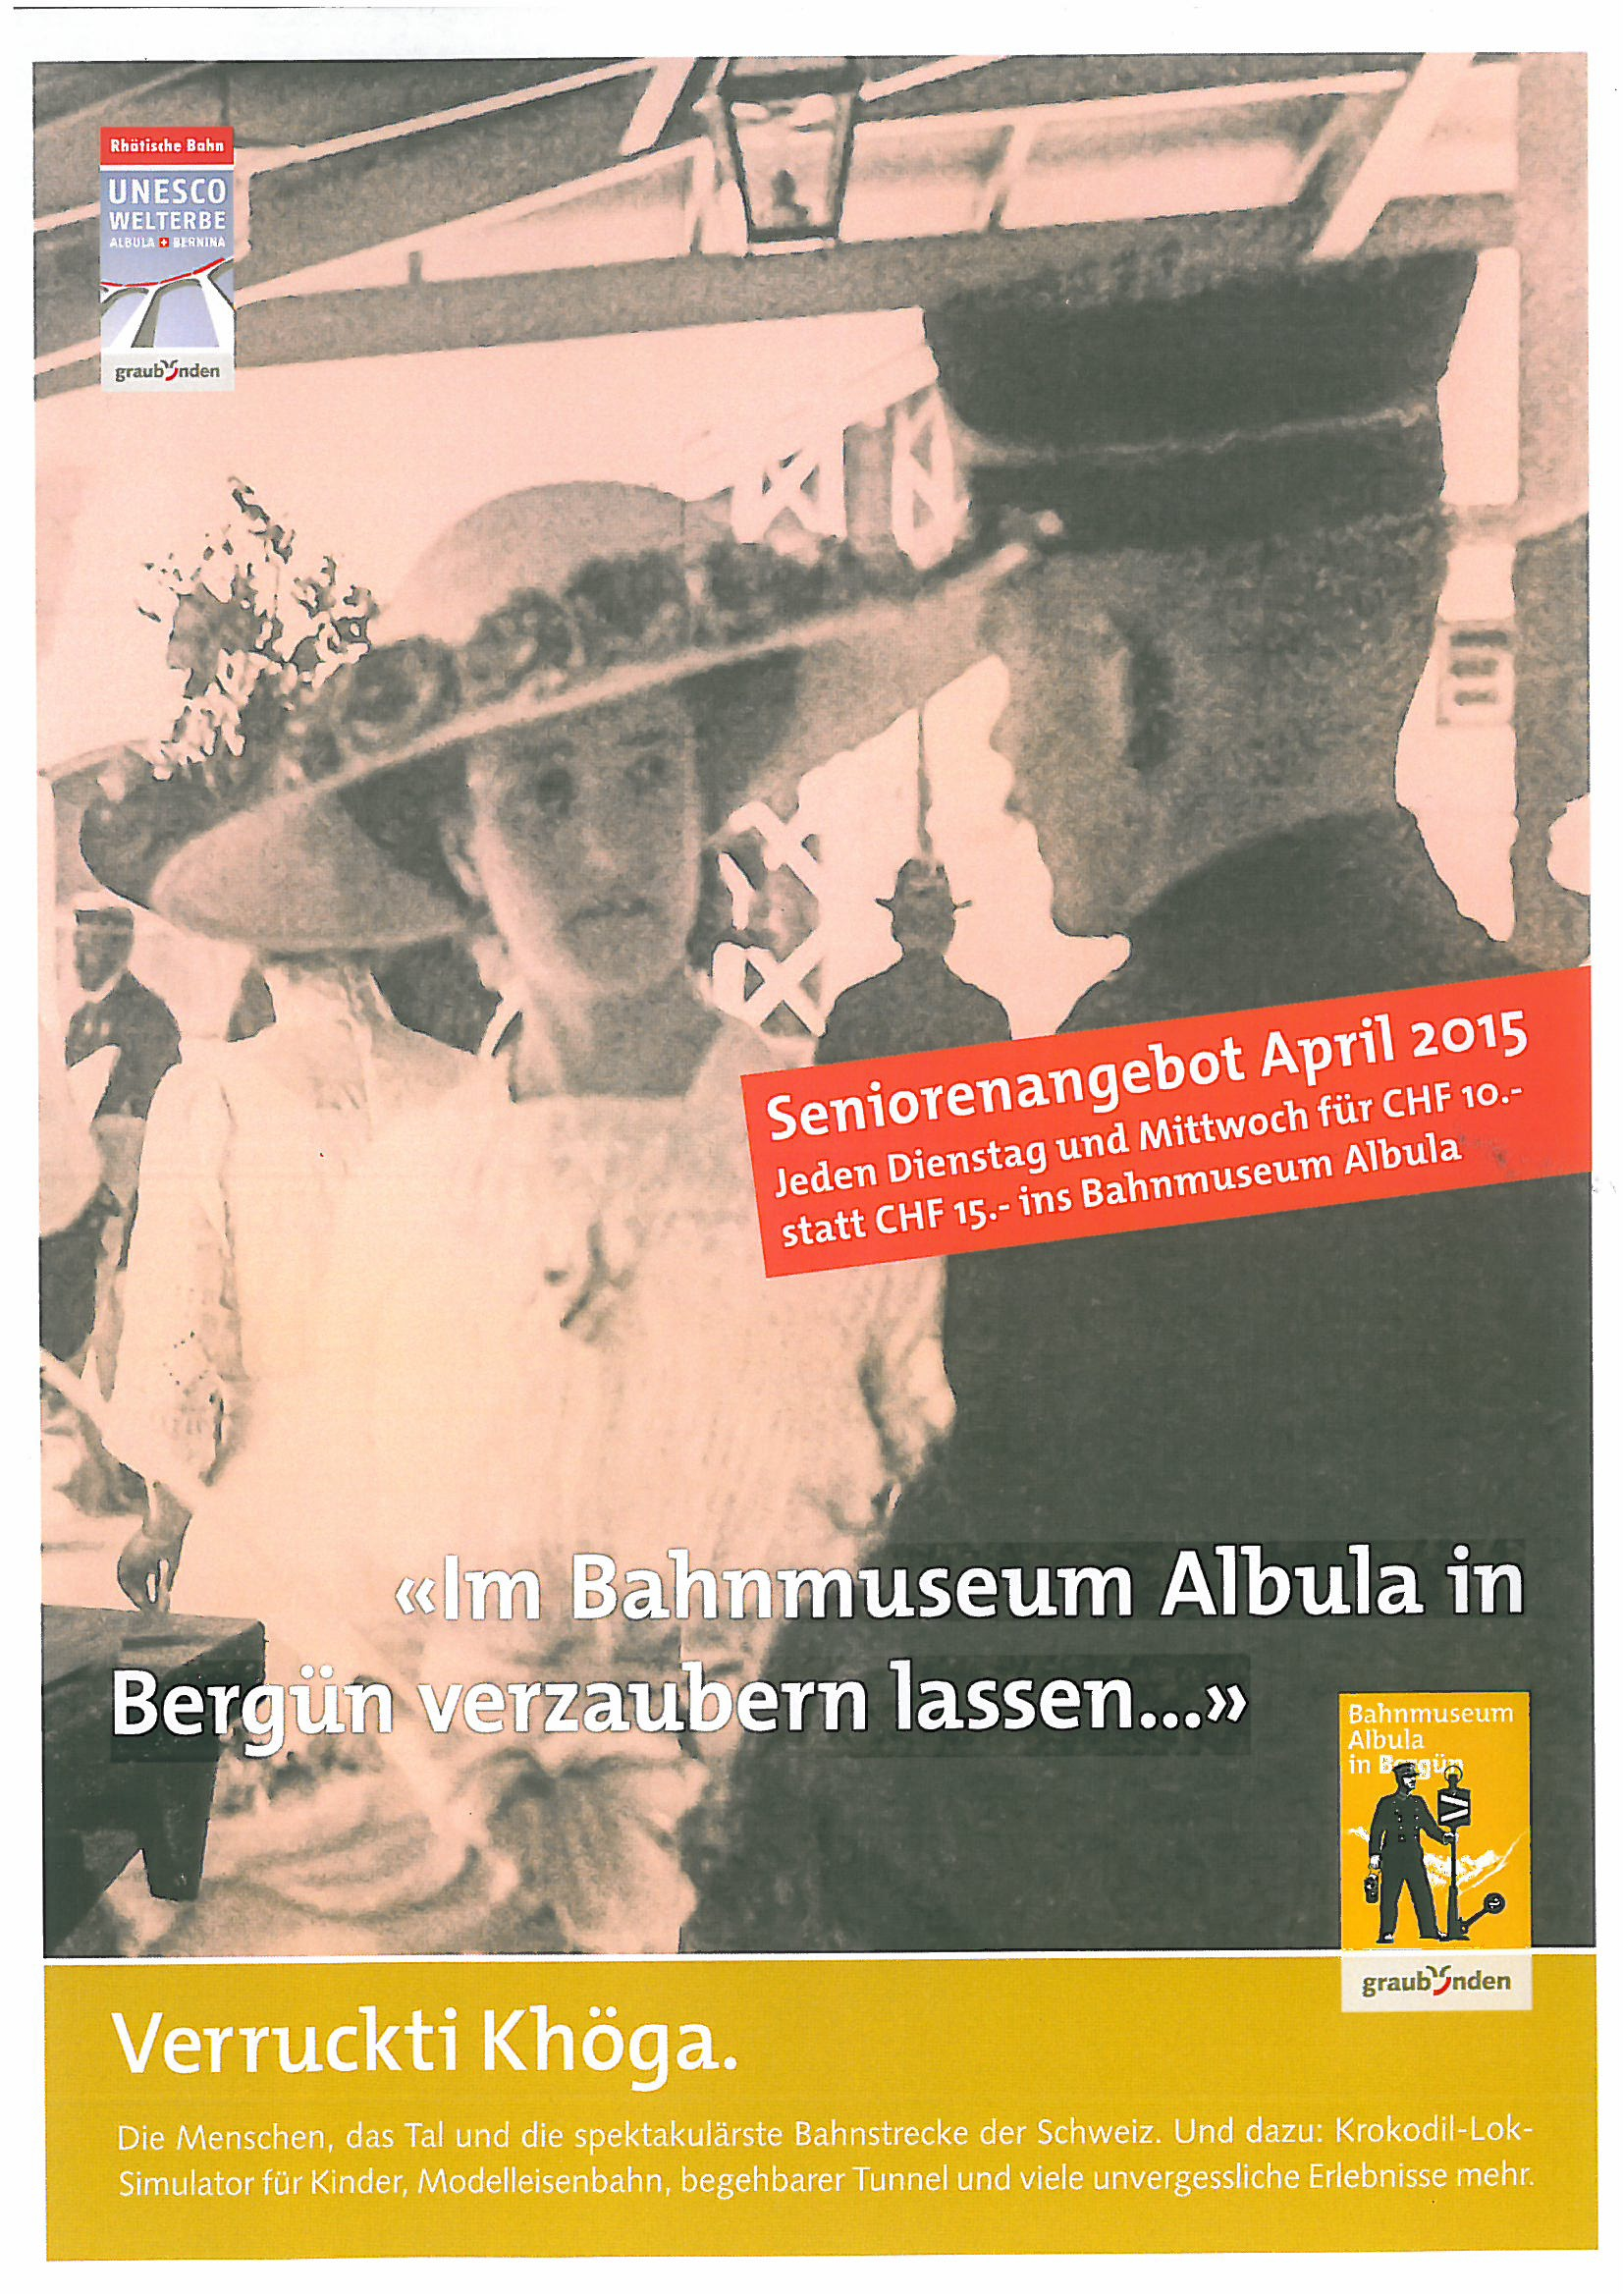 Seniorenangebot im Bahnmuseum Albula